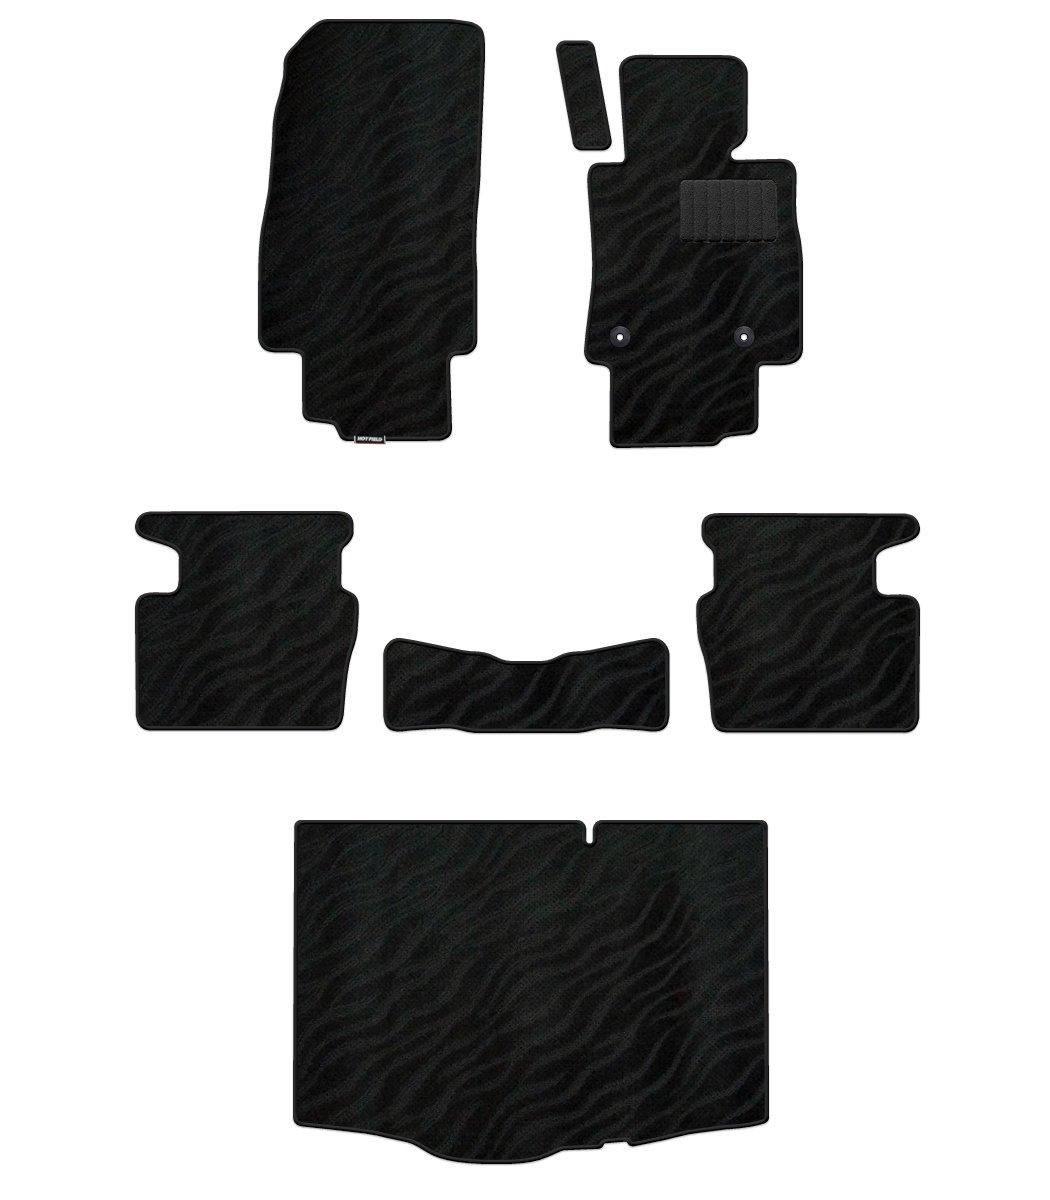 Hotfield マツダ デミオ DJ系 フロアマット&トランクマット WAVEブラック 前席マット:ロングタイプ(オリジナル仕様)フルタイム 4WD B01CXNRP8Q 前席マット:ロングタイプ(オリジナル仕様)フルタイム 4WD|WAVEブラック WAVEブラック 前席マット:ロングタイプ(オリジナル仕様)フルタイム 4WD